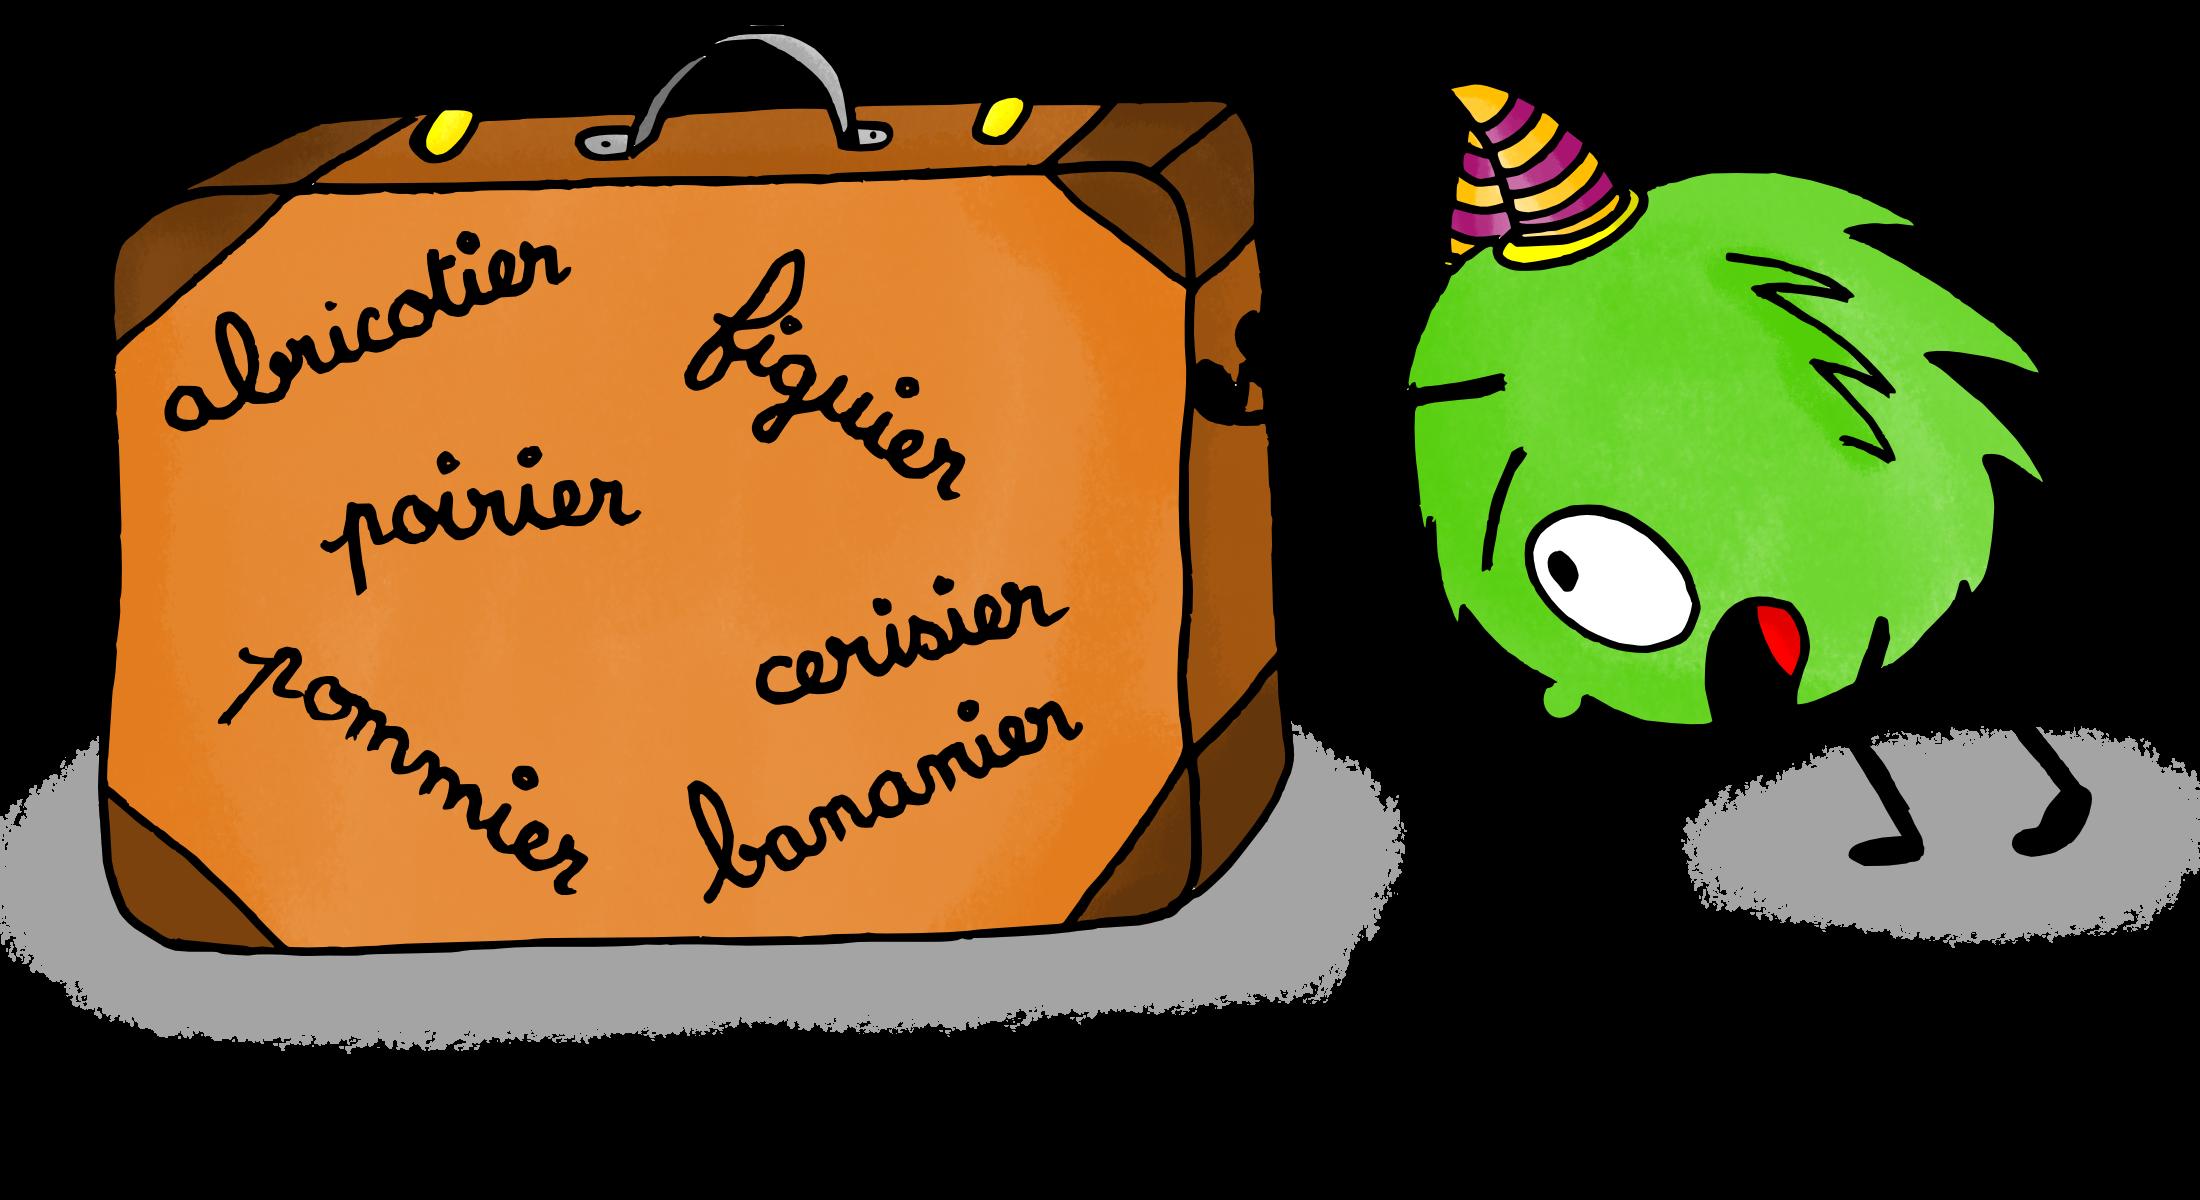 Vocabulaire le blog de mysticlolly - Dessin interactif ...